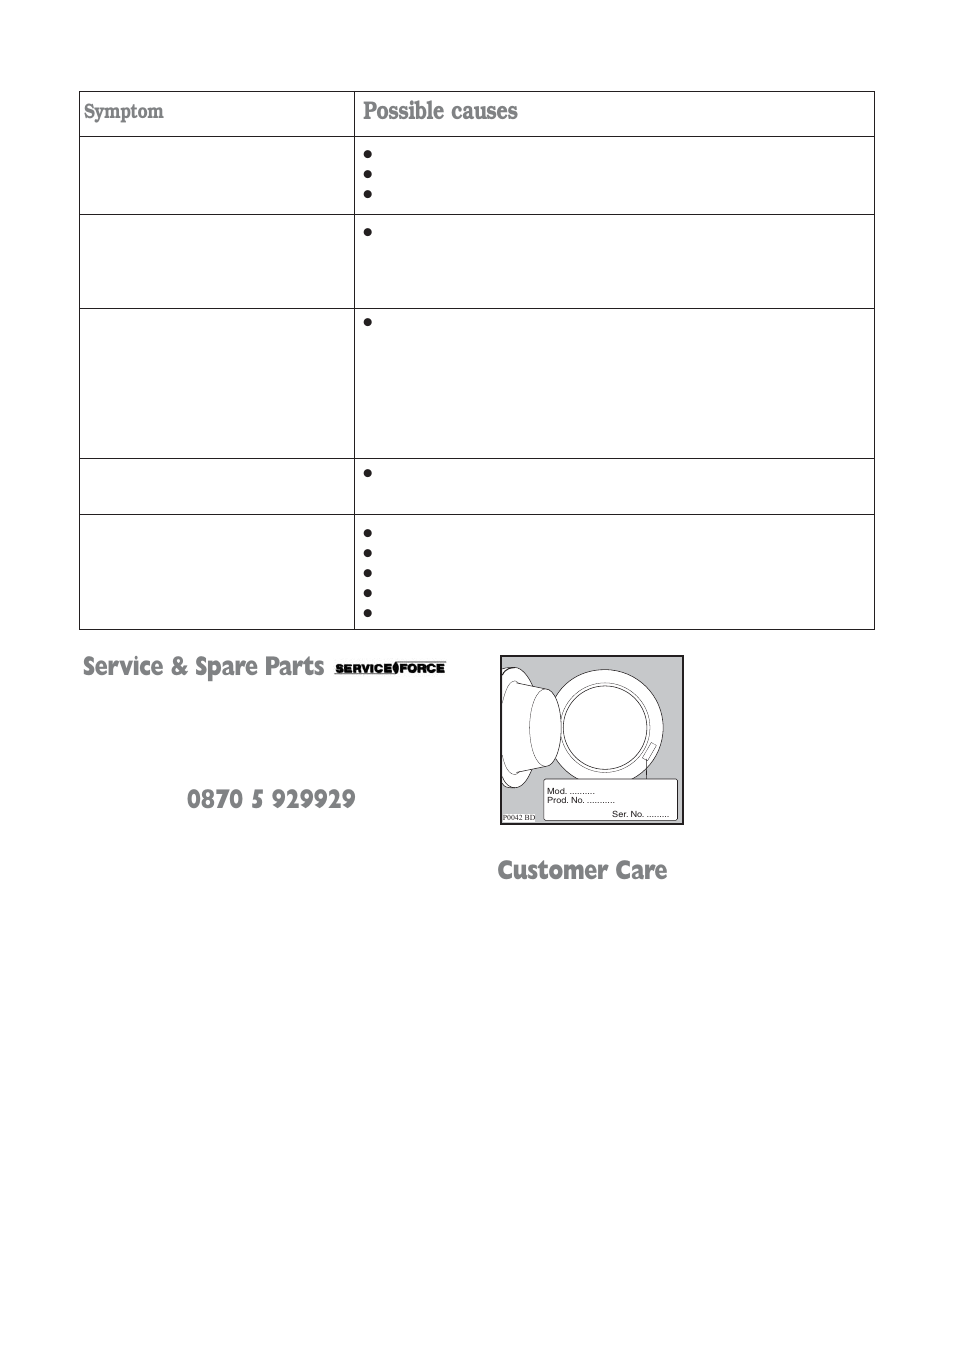 service spare parts customer care possible causes electrolux rh manualsdir com Operators Manual User Manual Template